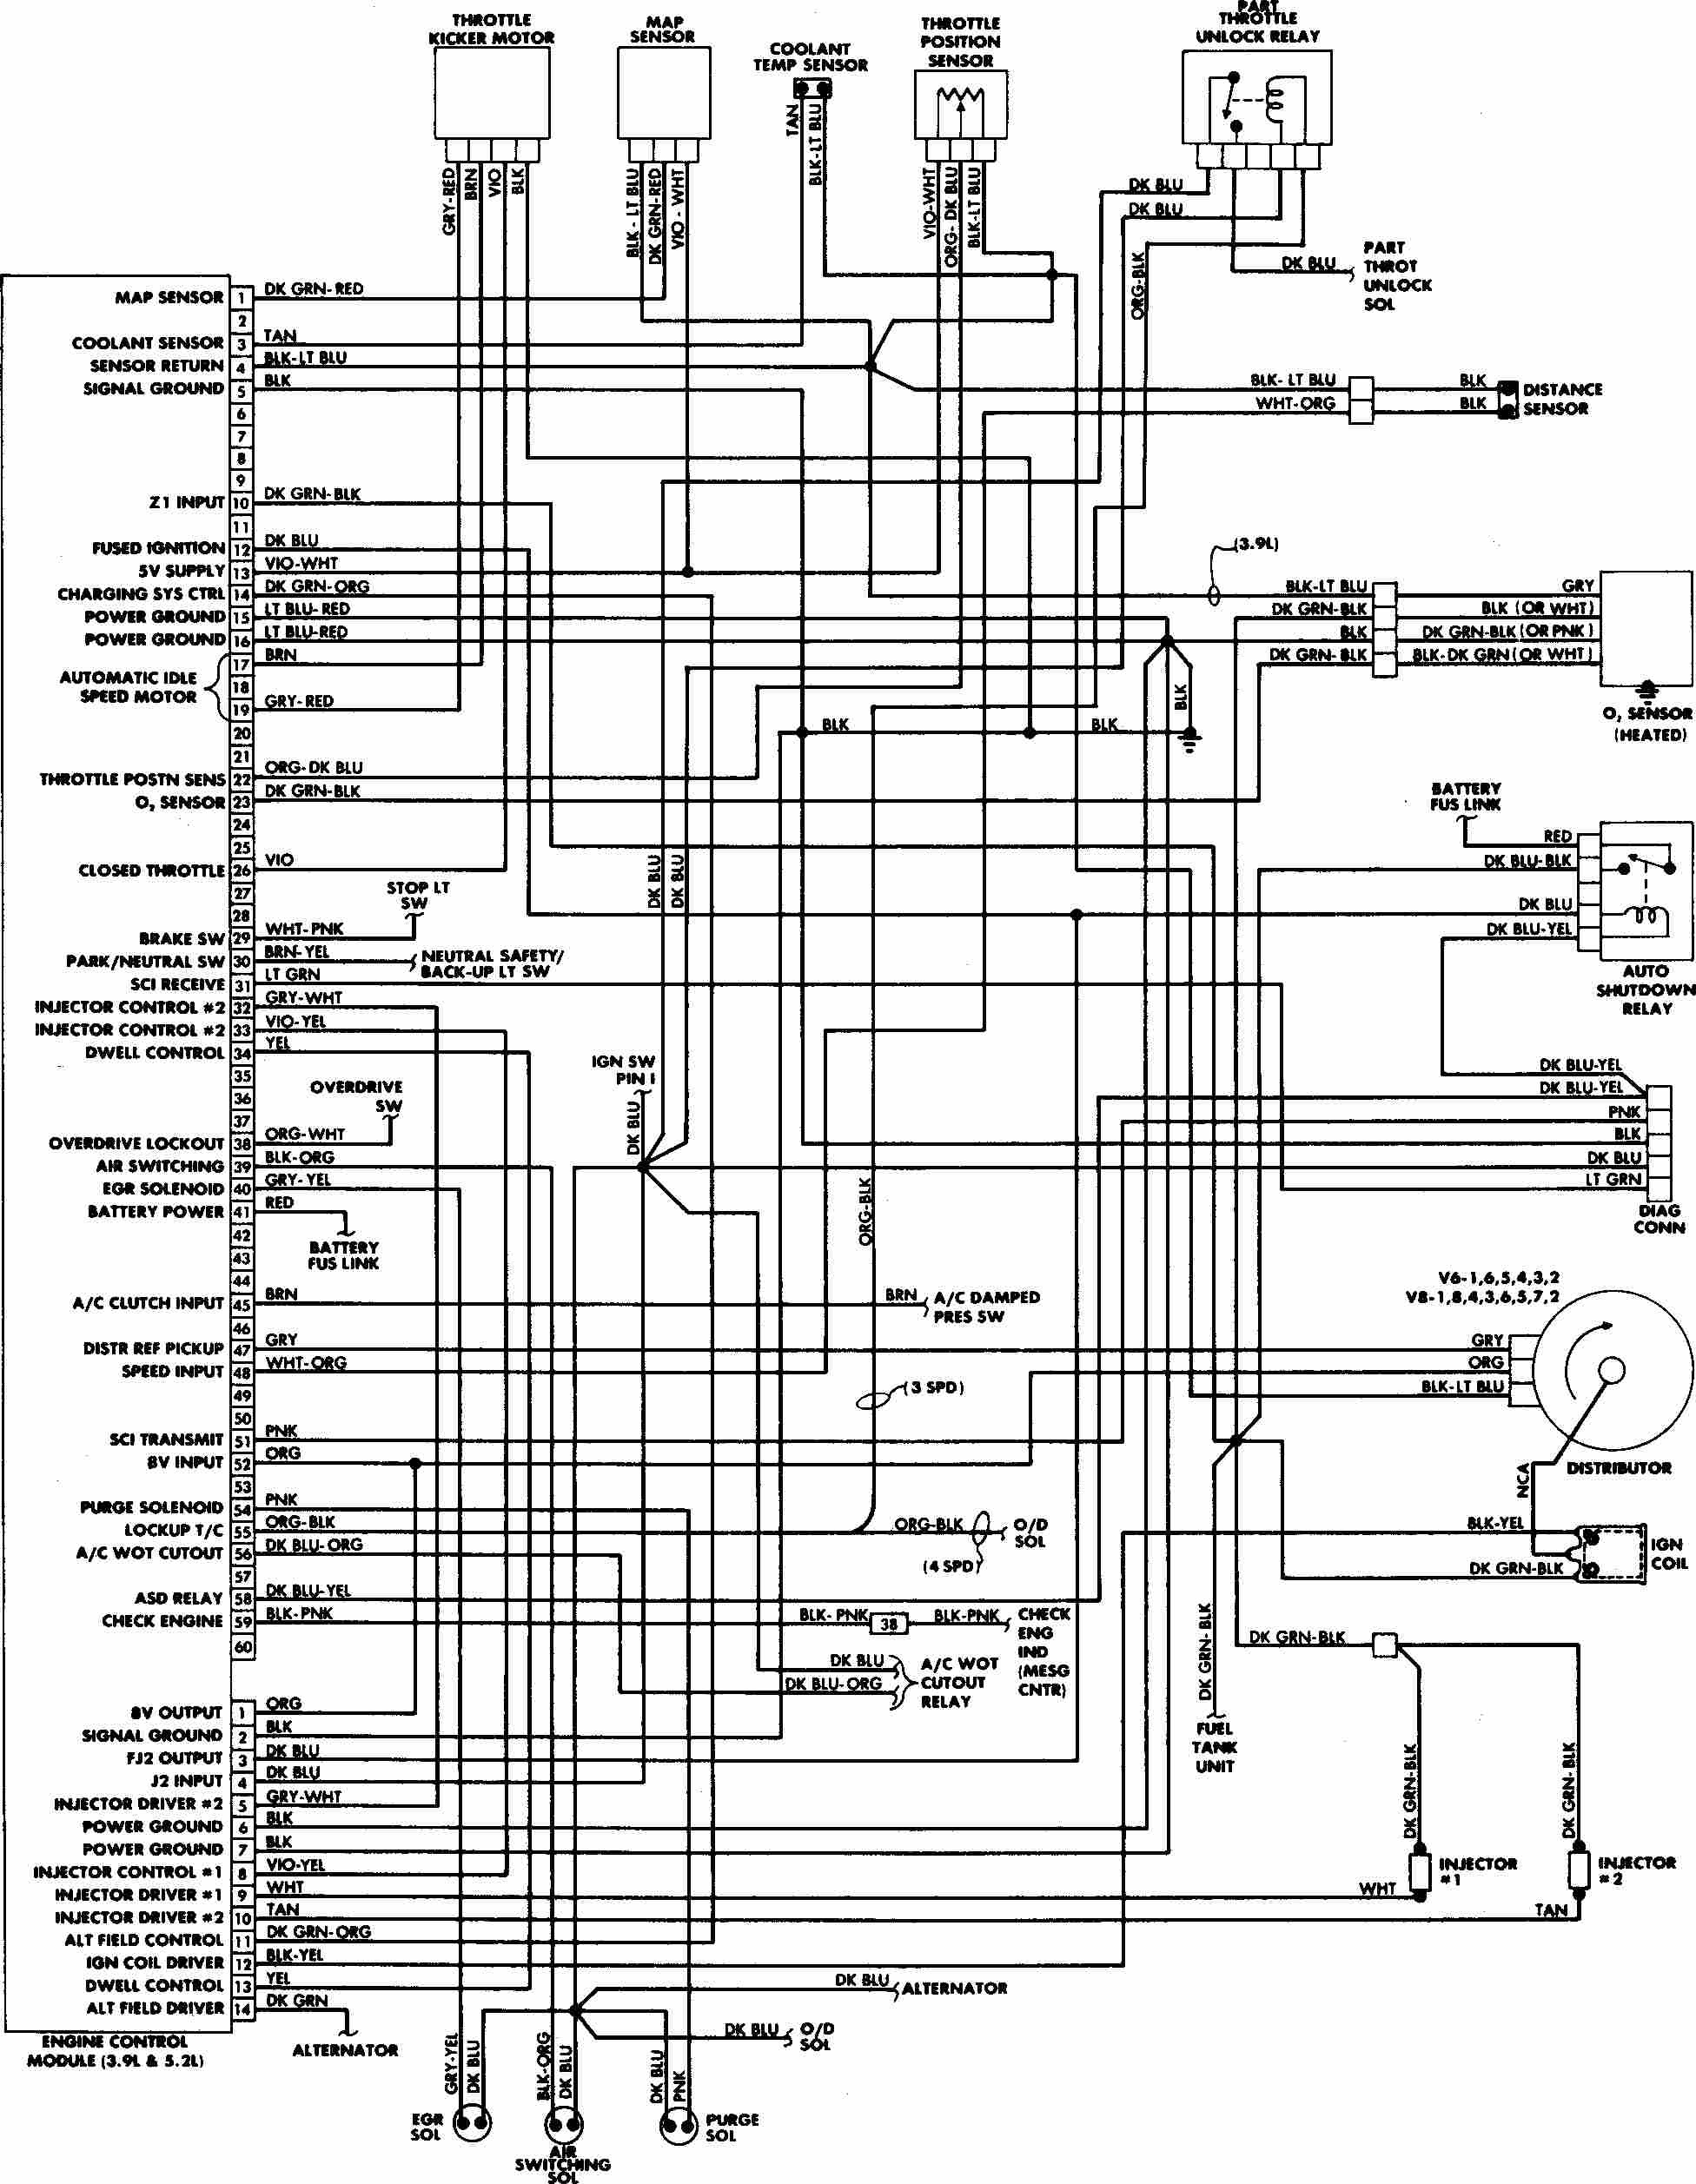 hight resolution of 2000 dodge durango engine diagram 2003 dodge durango emissions diagram free download wiring diagram